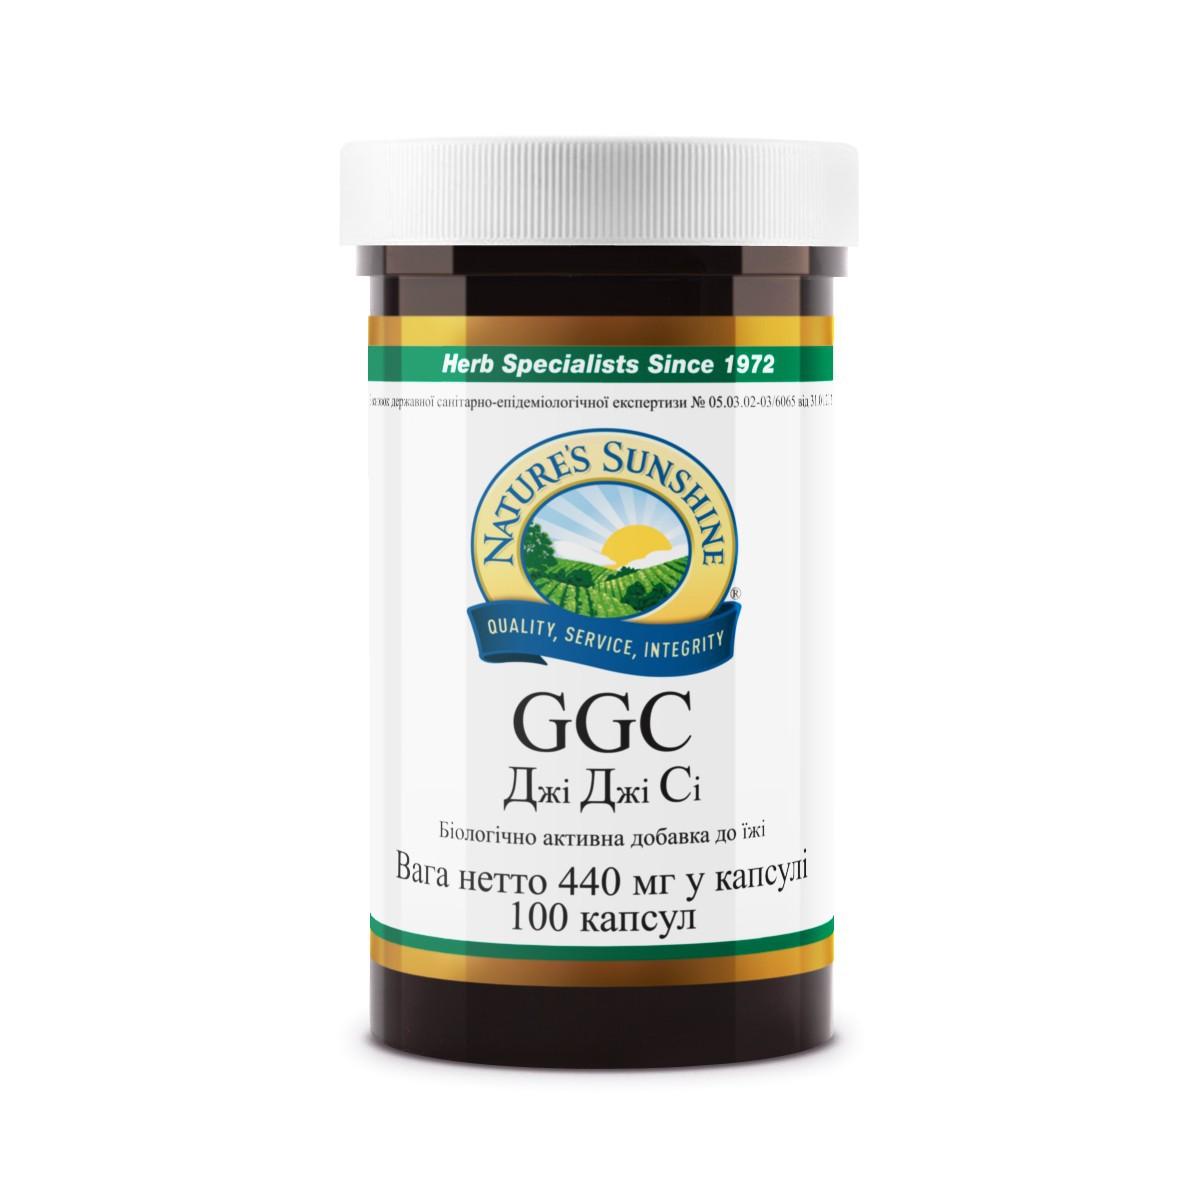 GGC [910] 20%